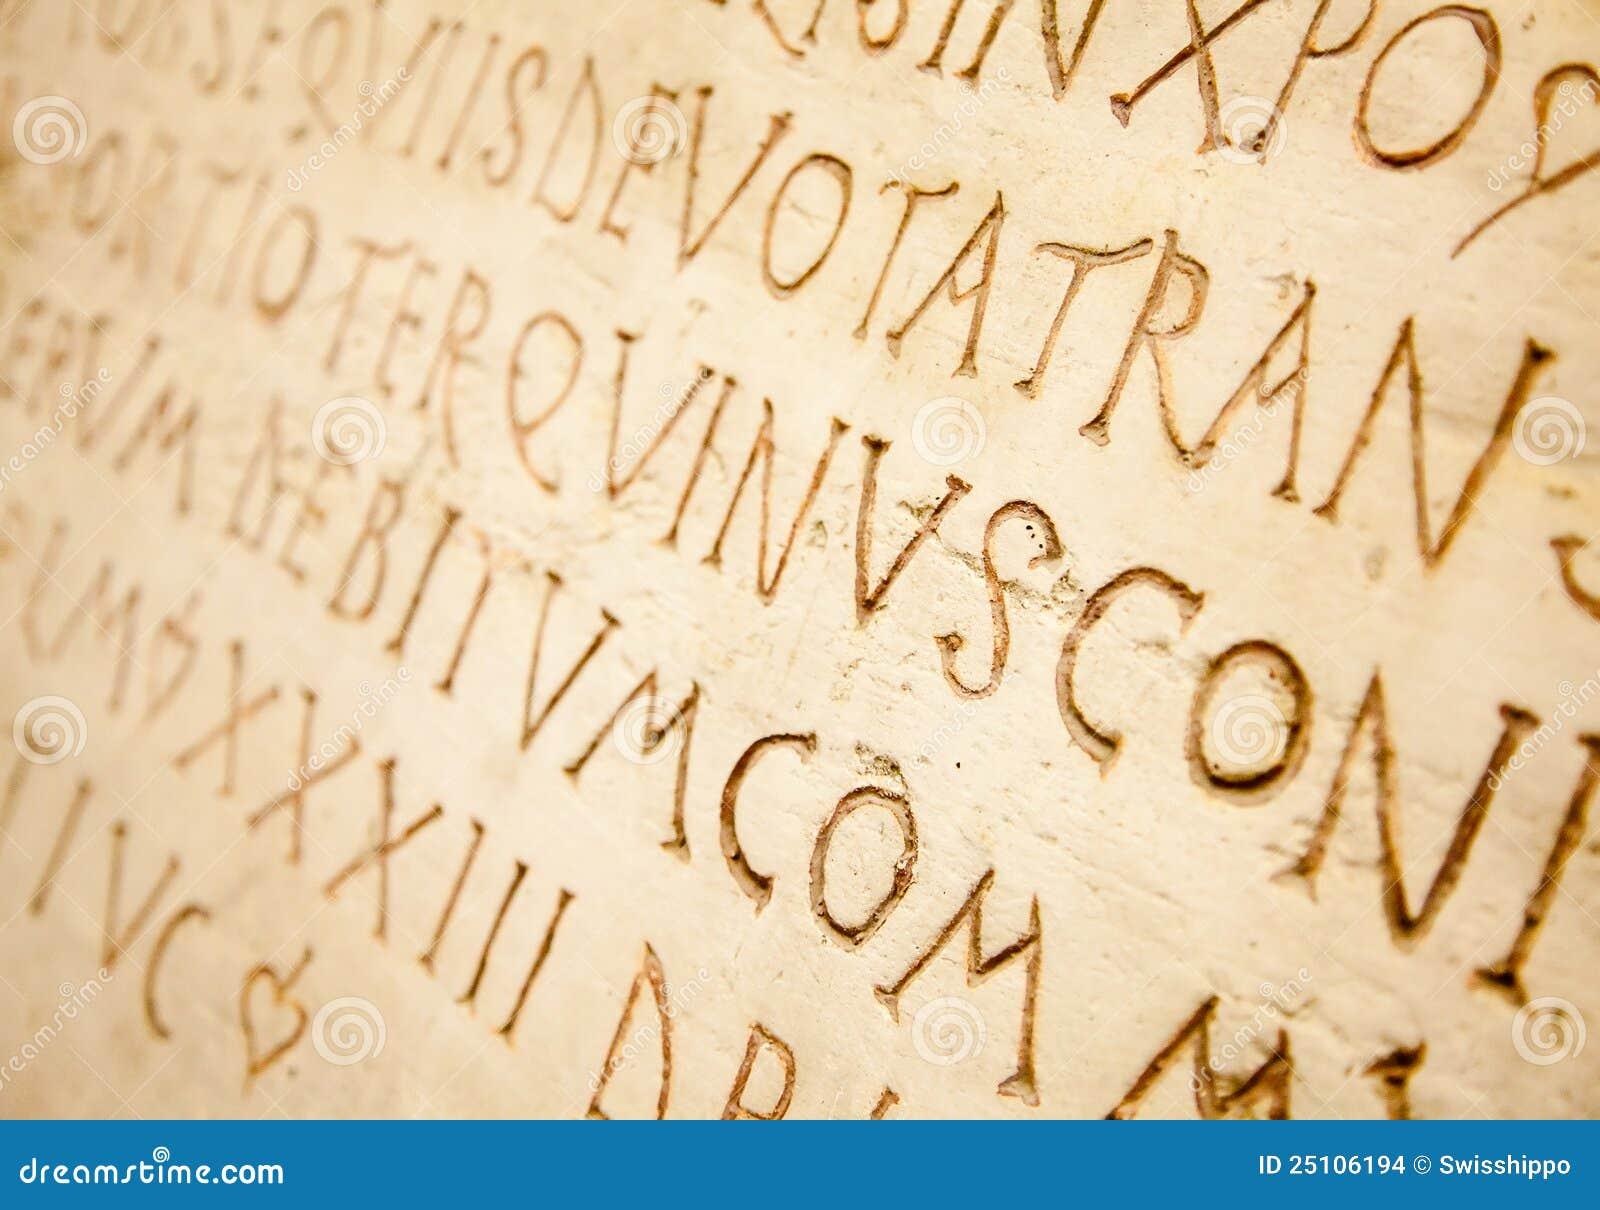 latin writing